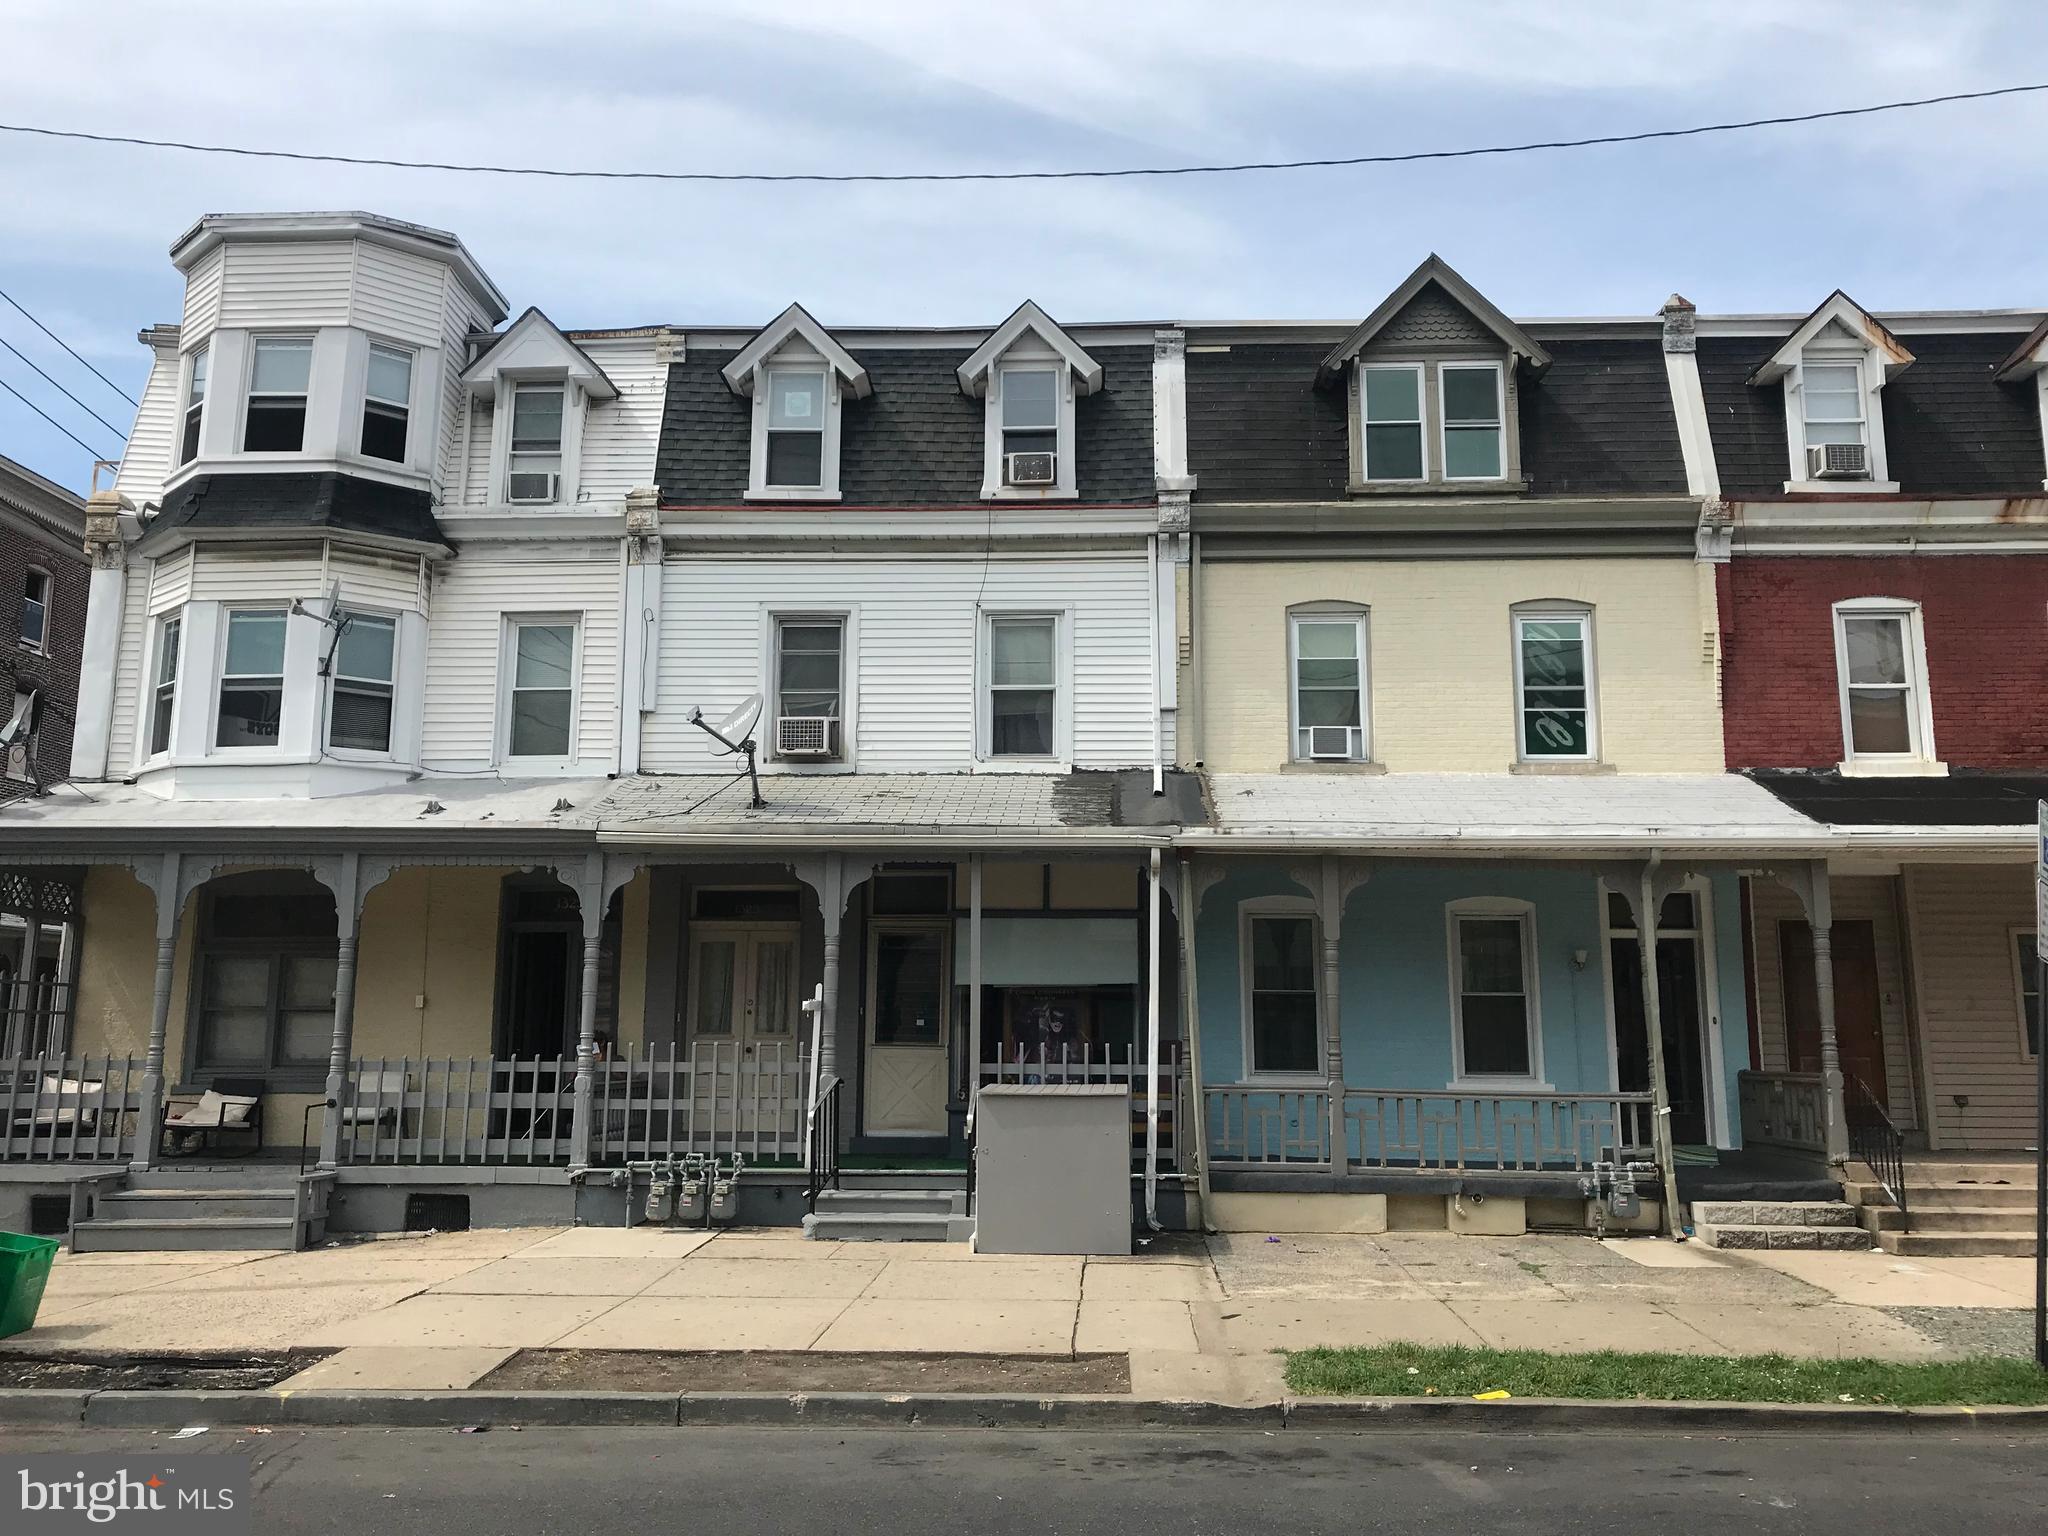 1323 W CHEW STREET, ALLENTOWN, PA 18102